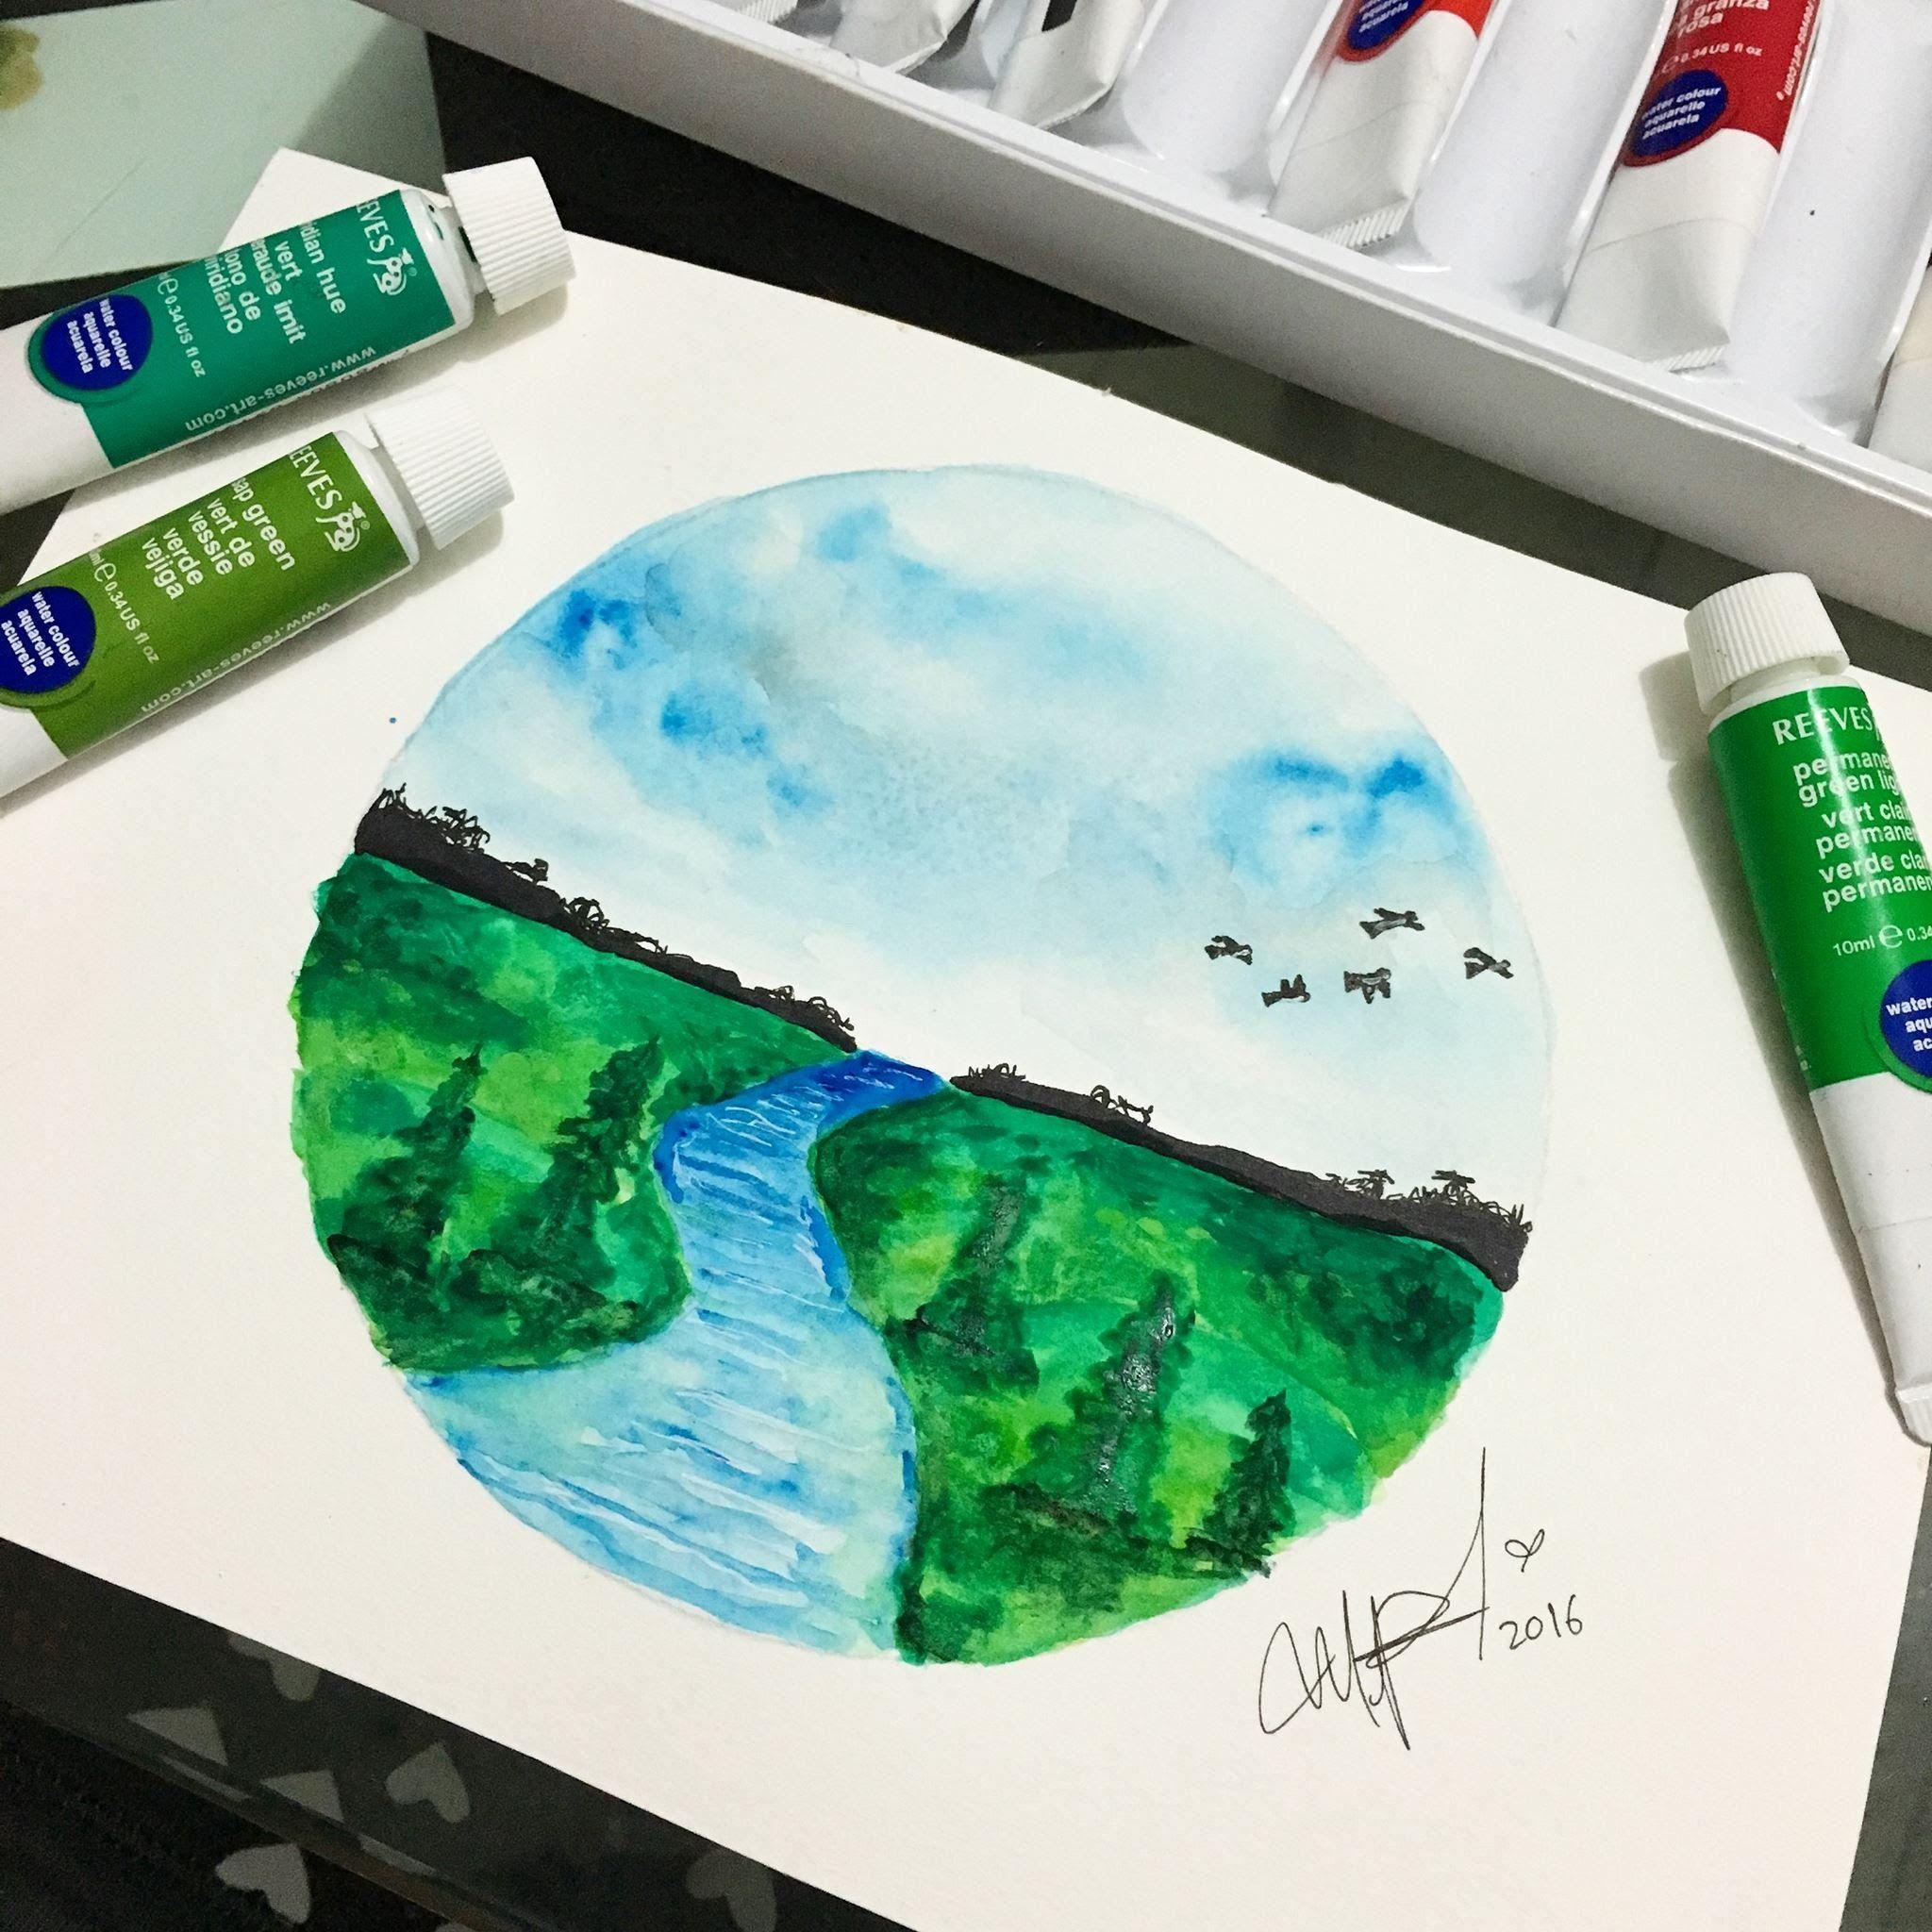 Como Dibujar Un Paisaje En Acuarelas Facil De Hacer How To Draw